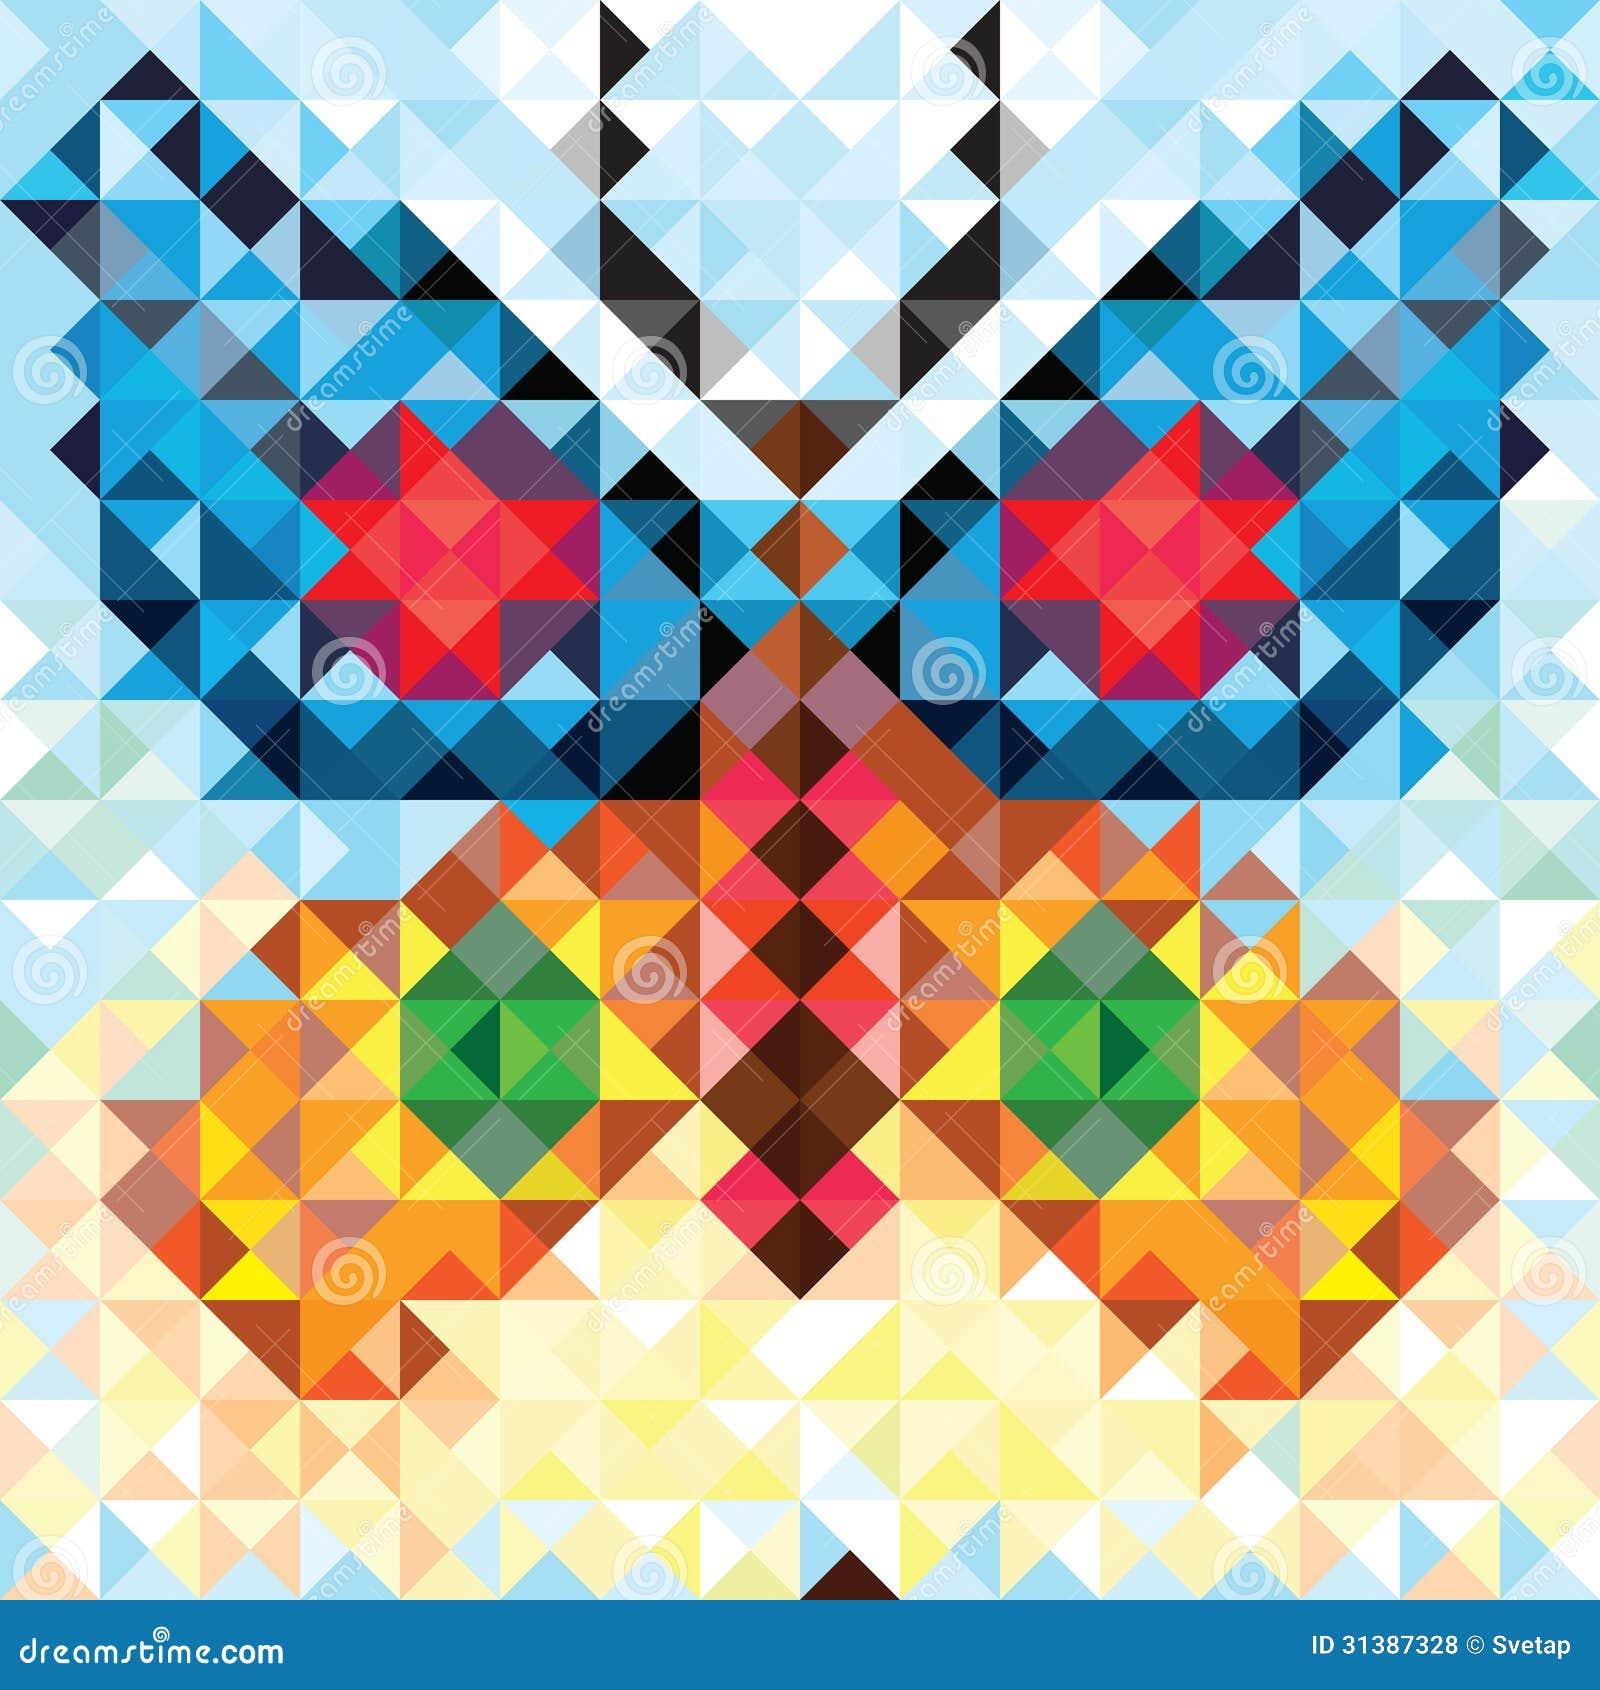 Seamless love pattern of geometric butterfly